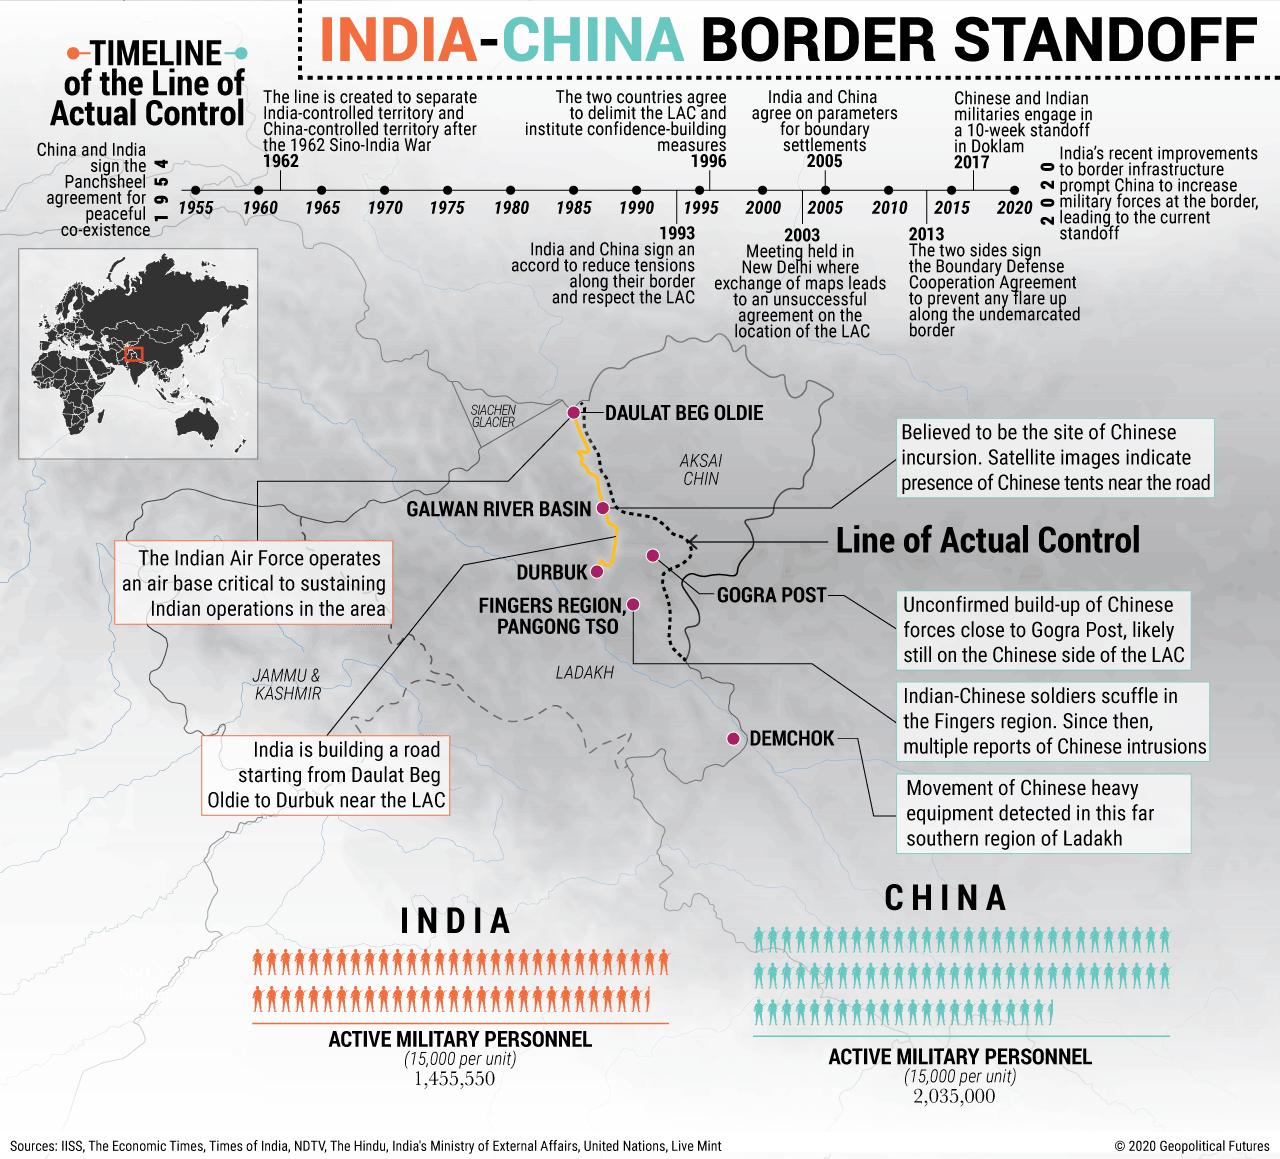 India-China Border Standoff